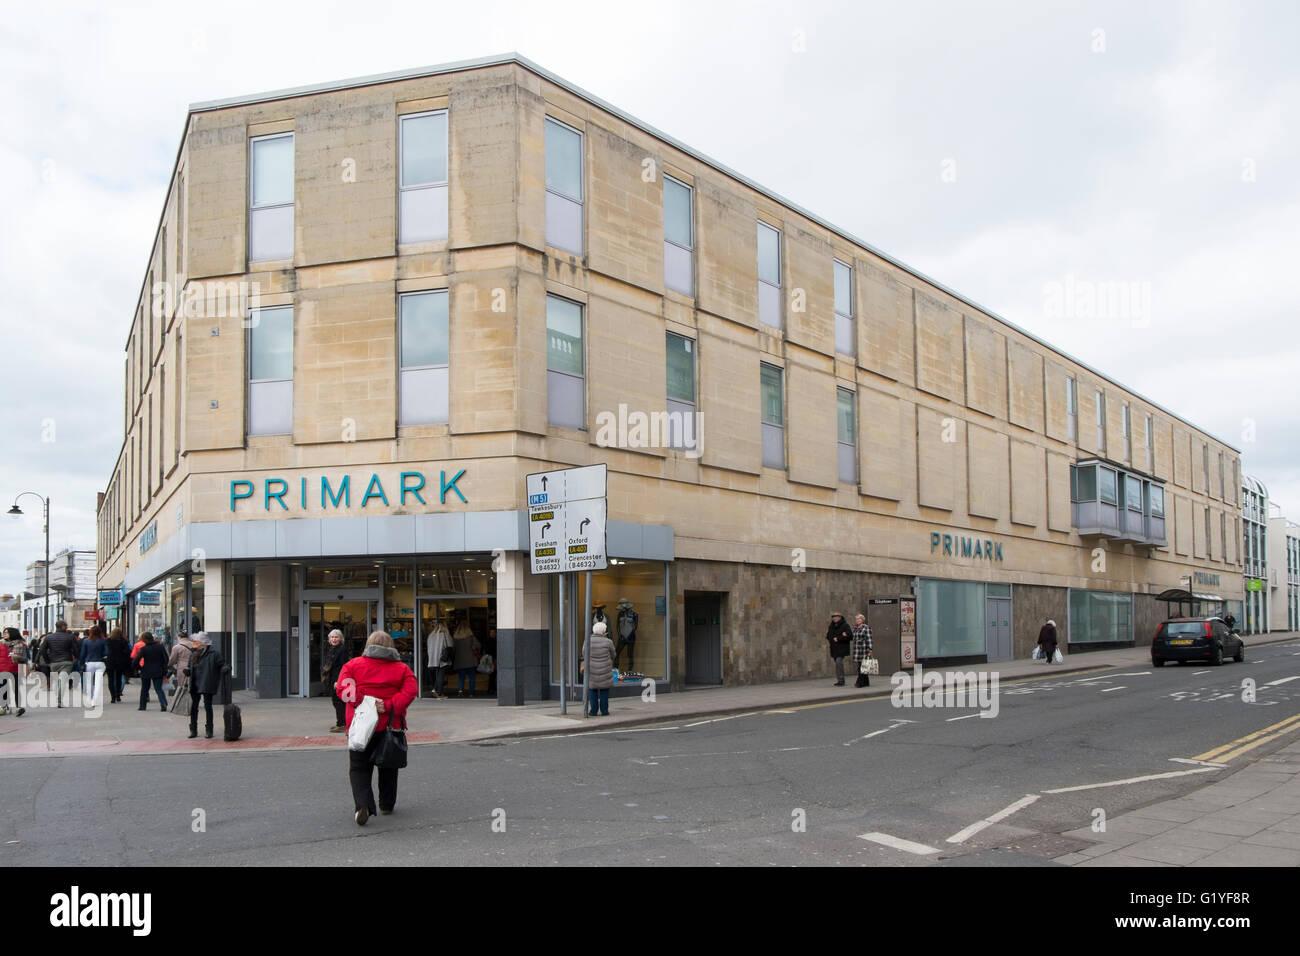 Primark clothes shop in Cheltenham, Gloucestershire, UK - Stock Image